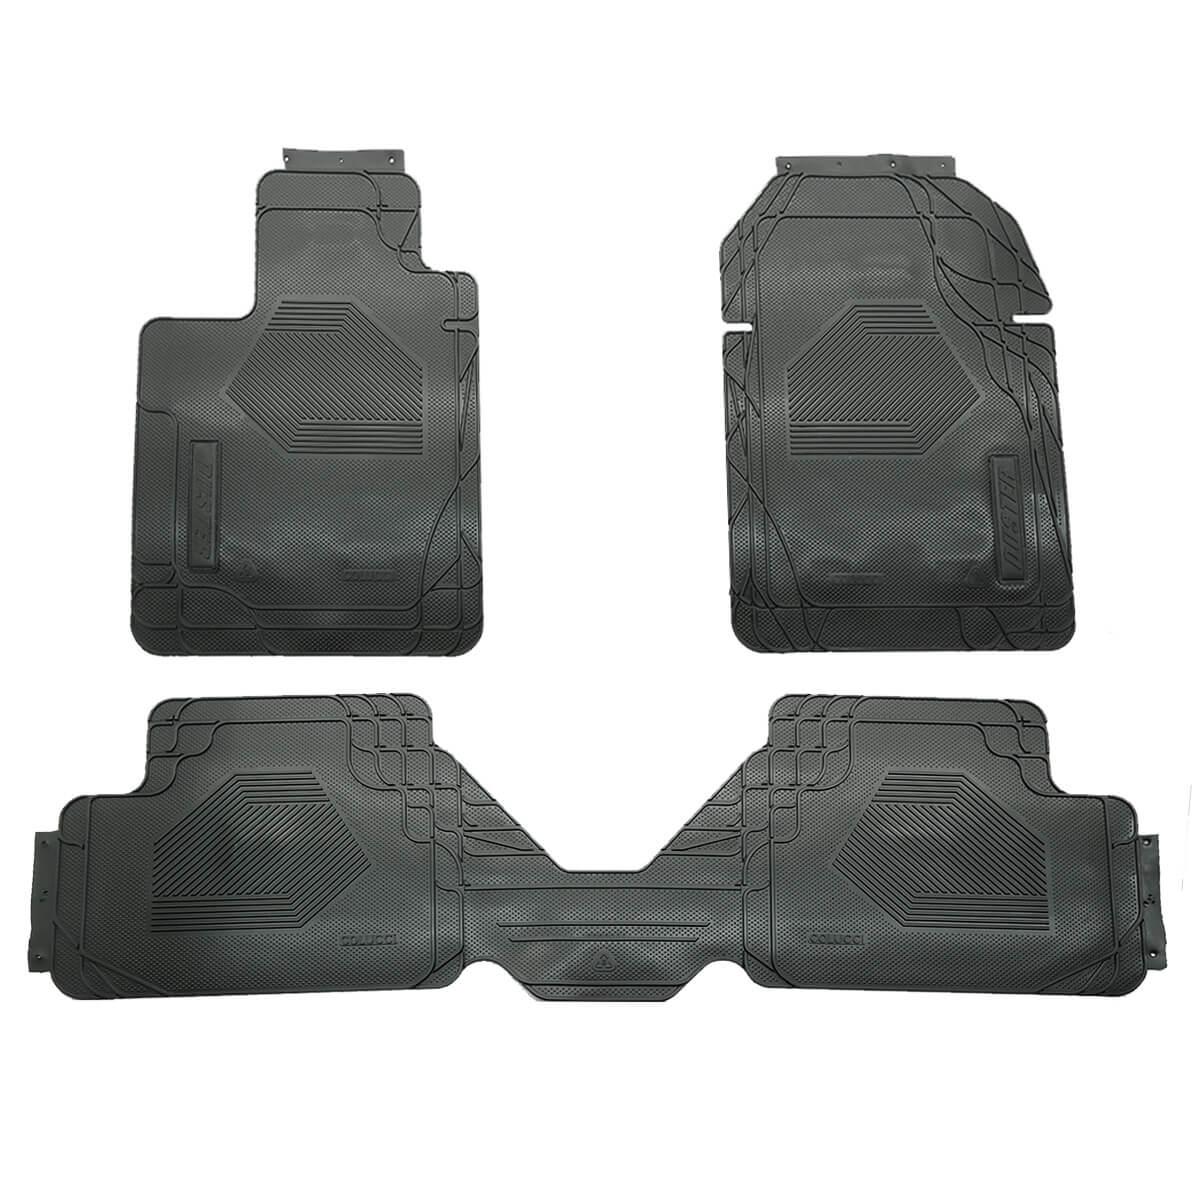 Tapete personalizado PVC flexível Duster 2012 a 2018 ou Duster Oroch 2016 2017 2018